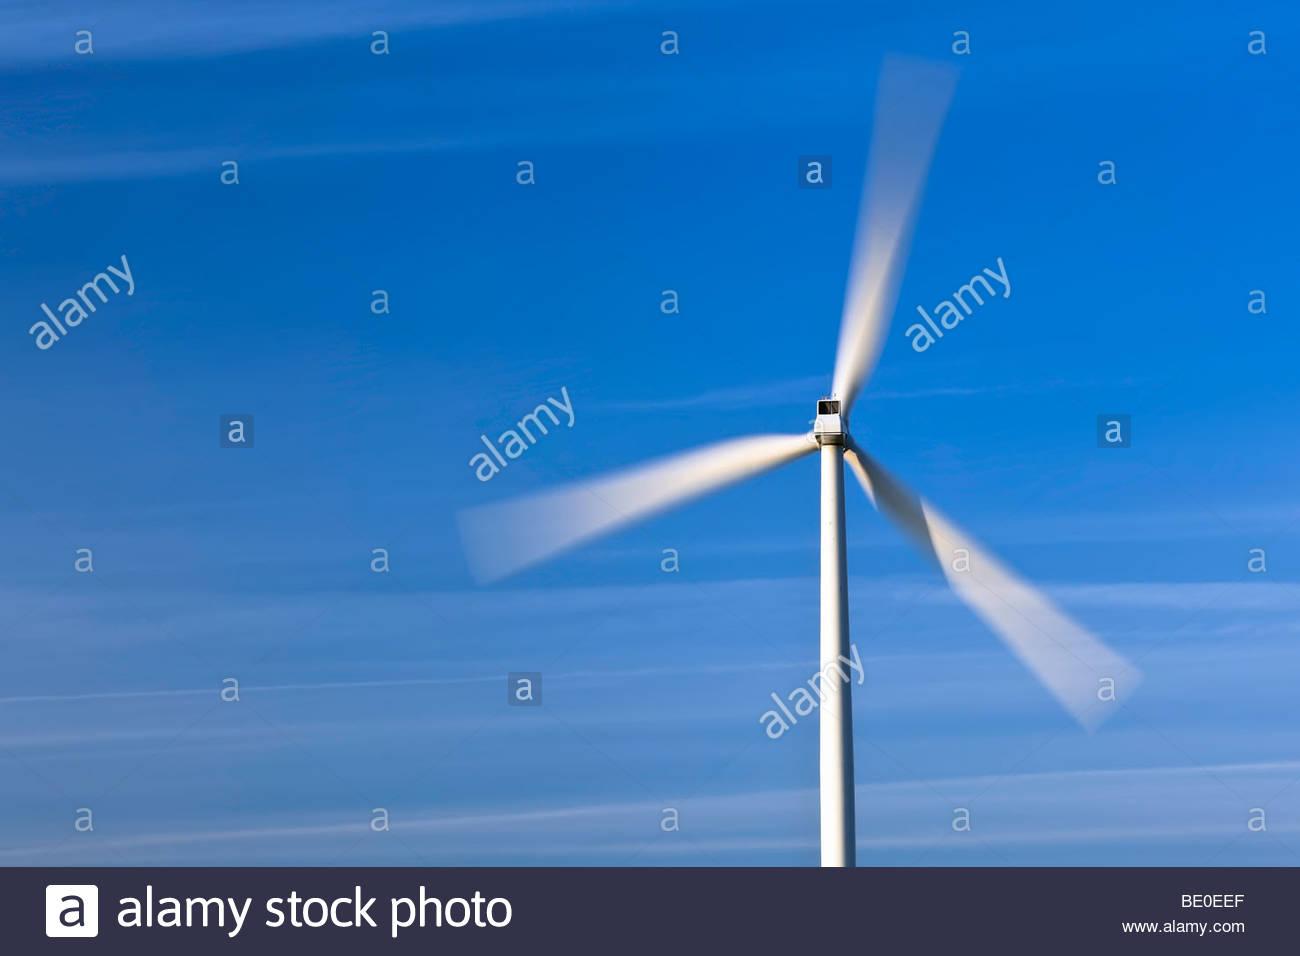 Windkraftanlage, klingen in Bewegung Stockbild